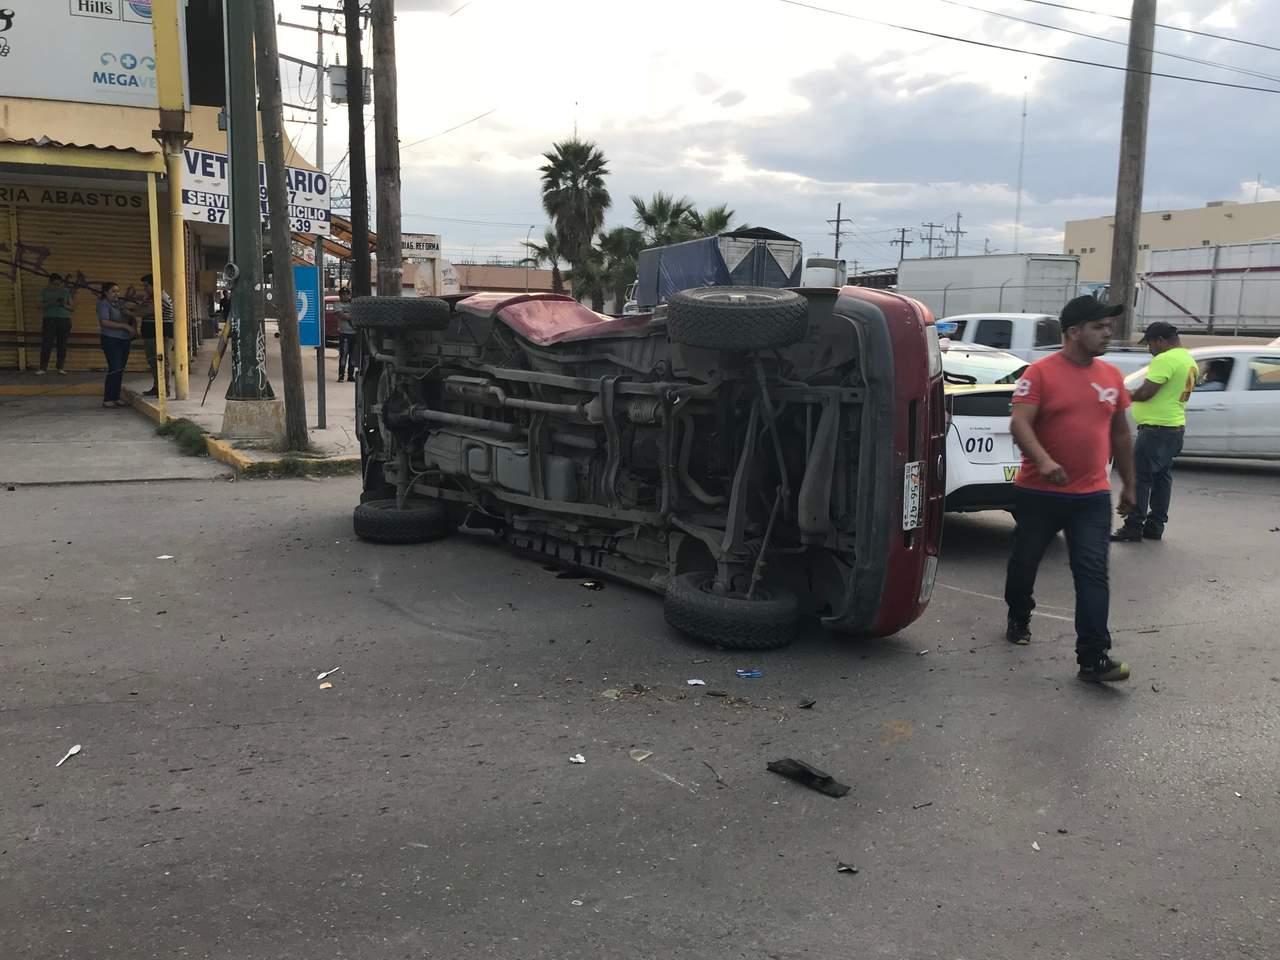 Vuelca camioneta frente al Mercado de Abastos; dos lesionados